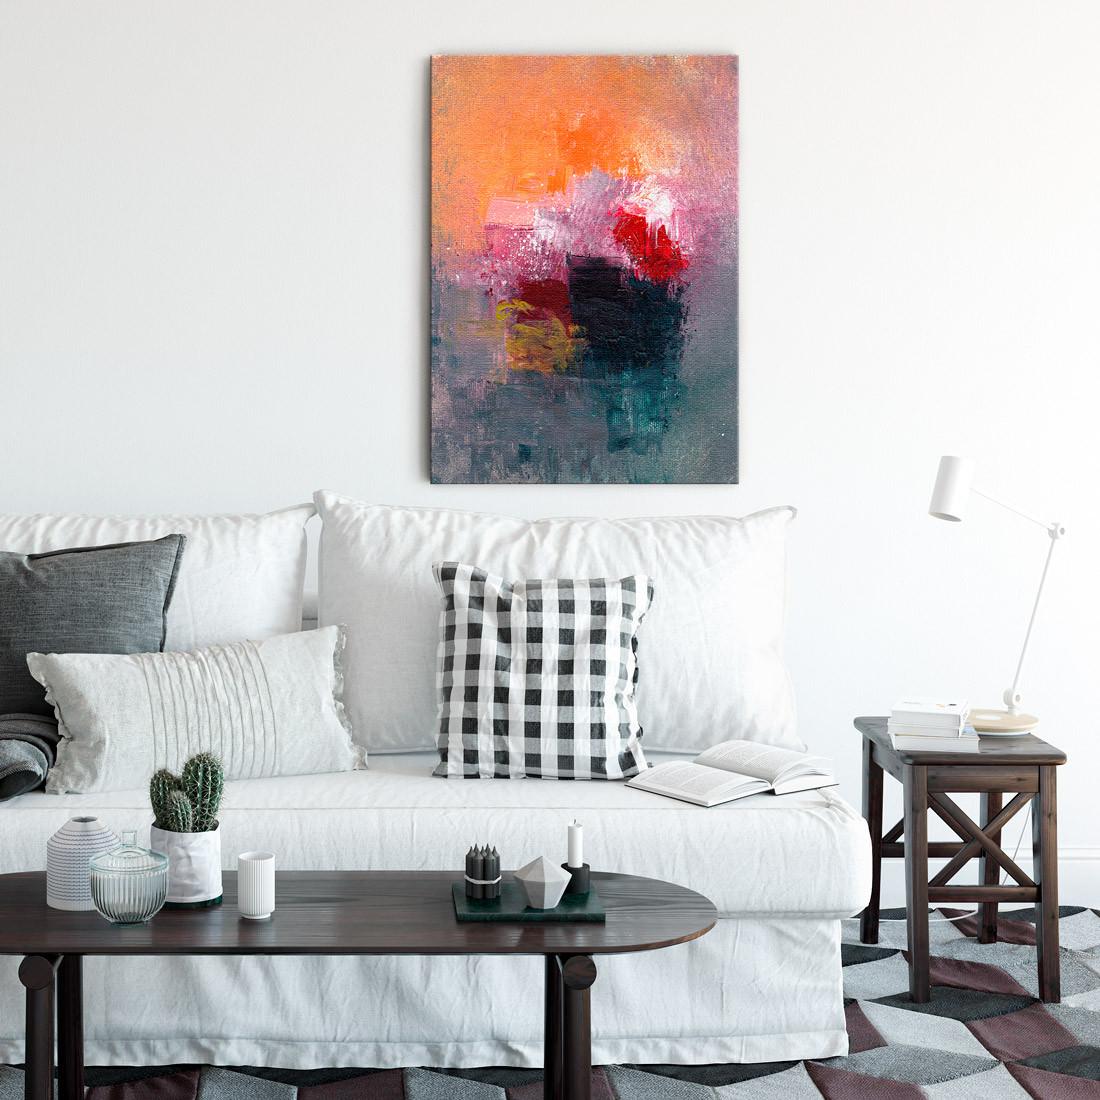 Quadro Decorativo Pintura Abstrata Mancha de Tinta